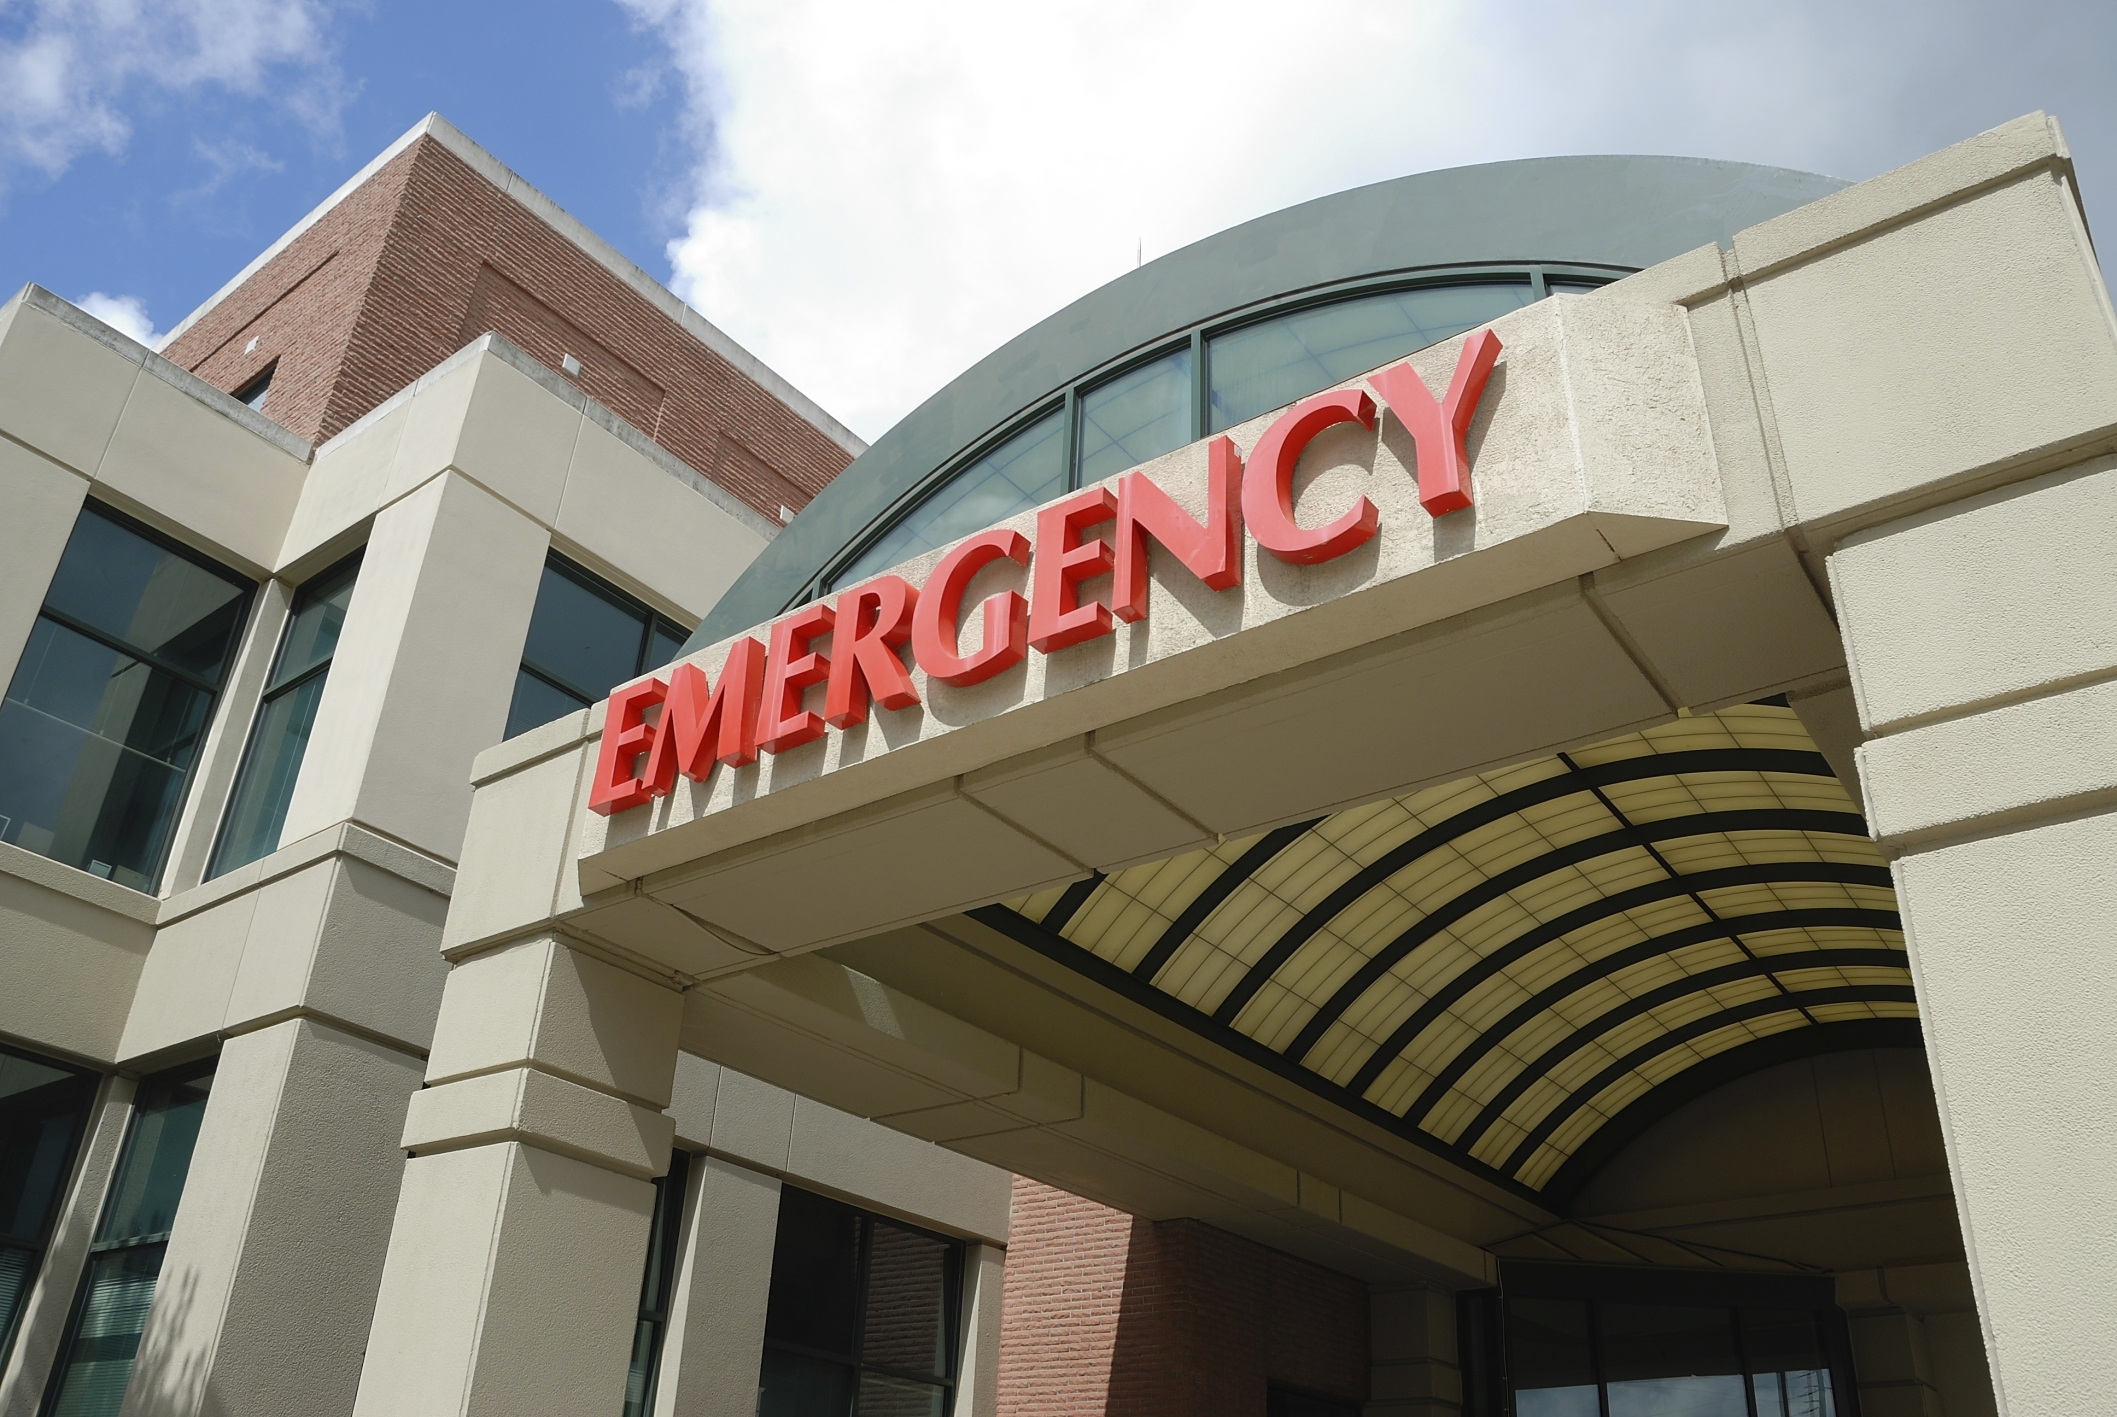 Emergency entrance at a hospital